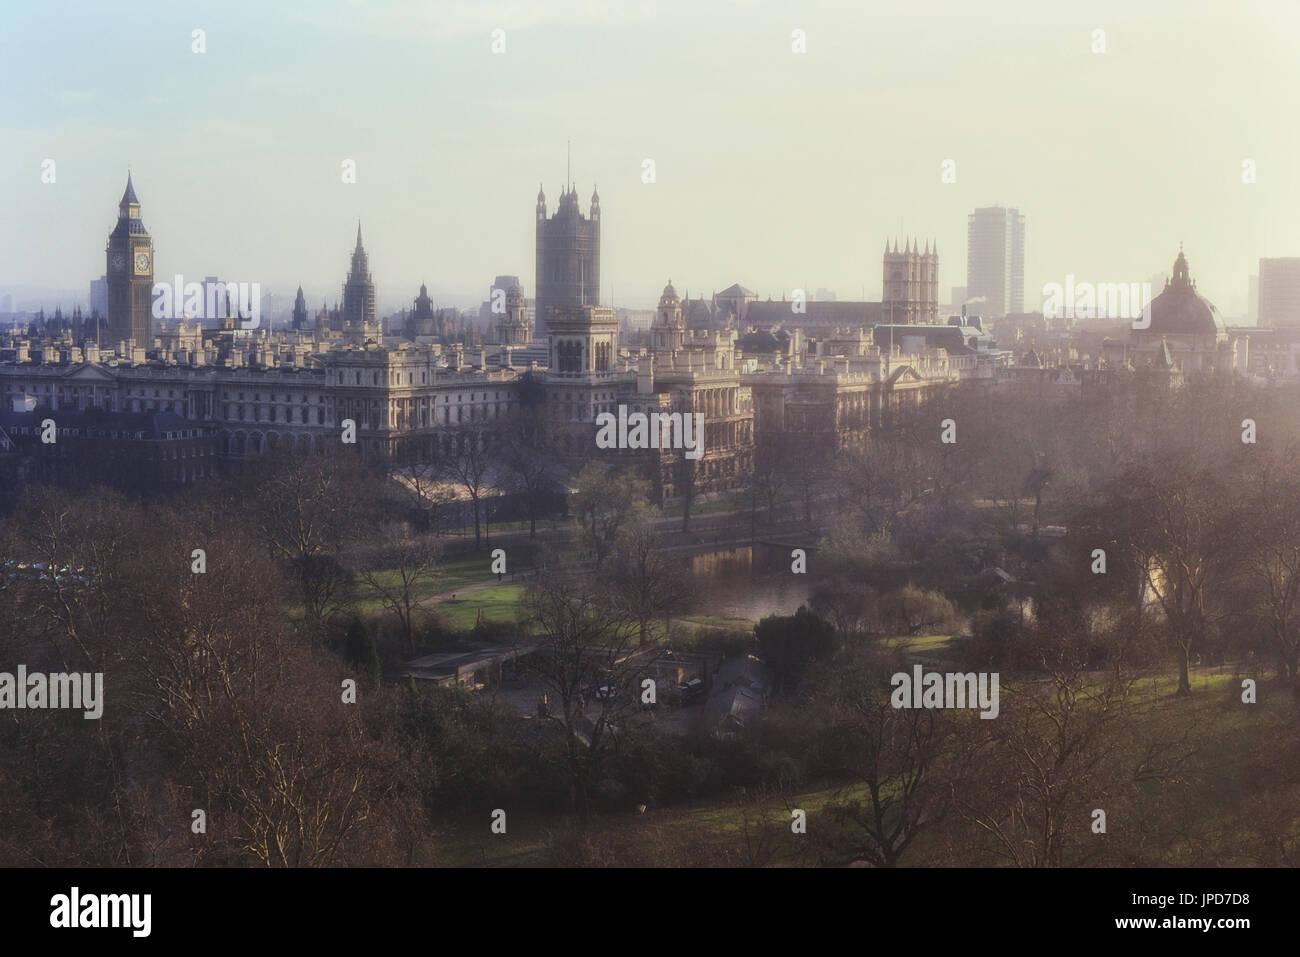 Whitehall viewed from Duke of York column, London, England, UK - Stock Image